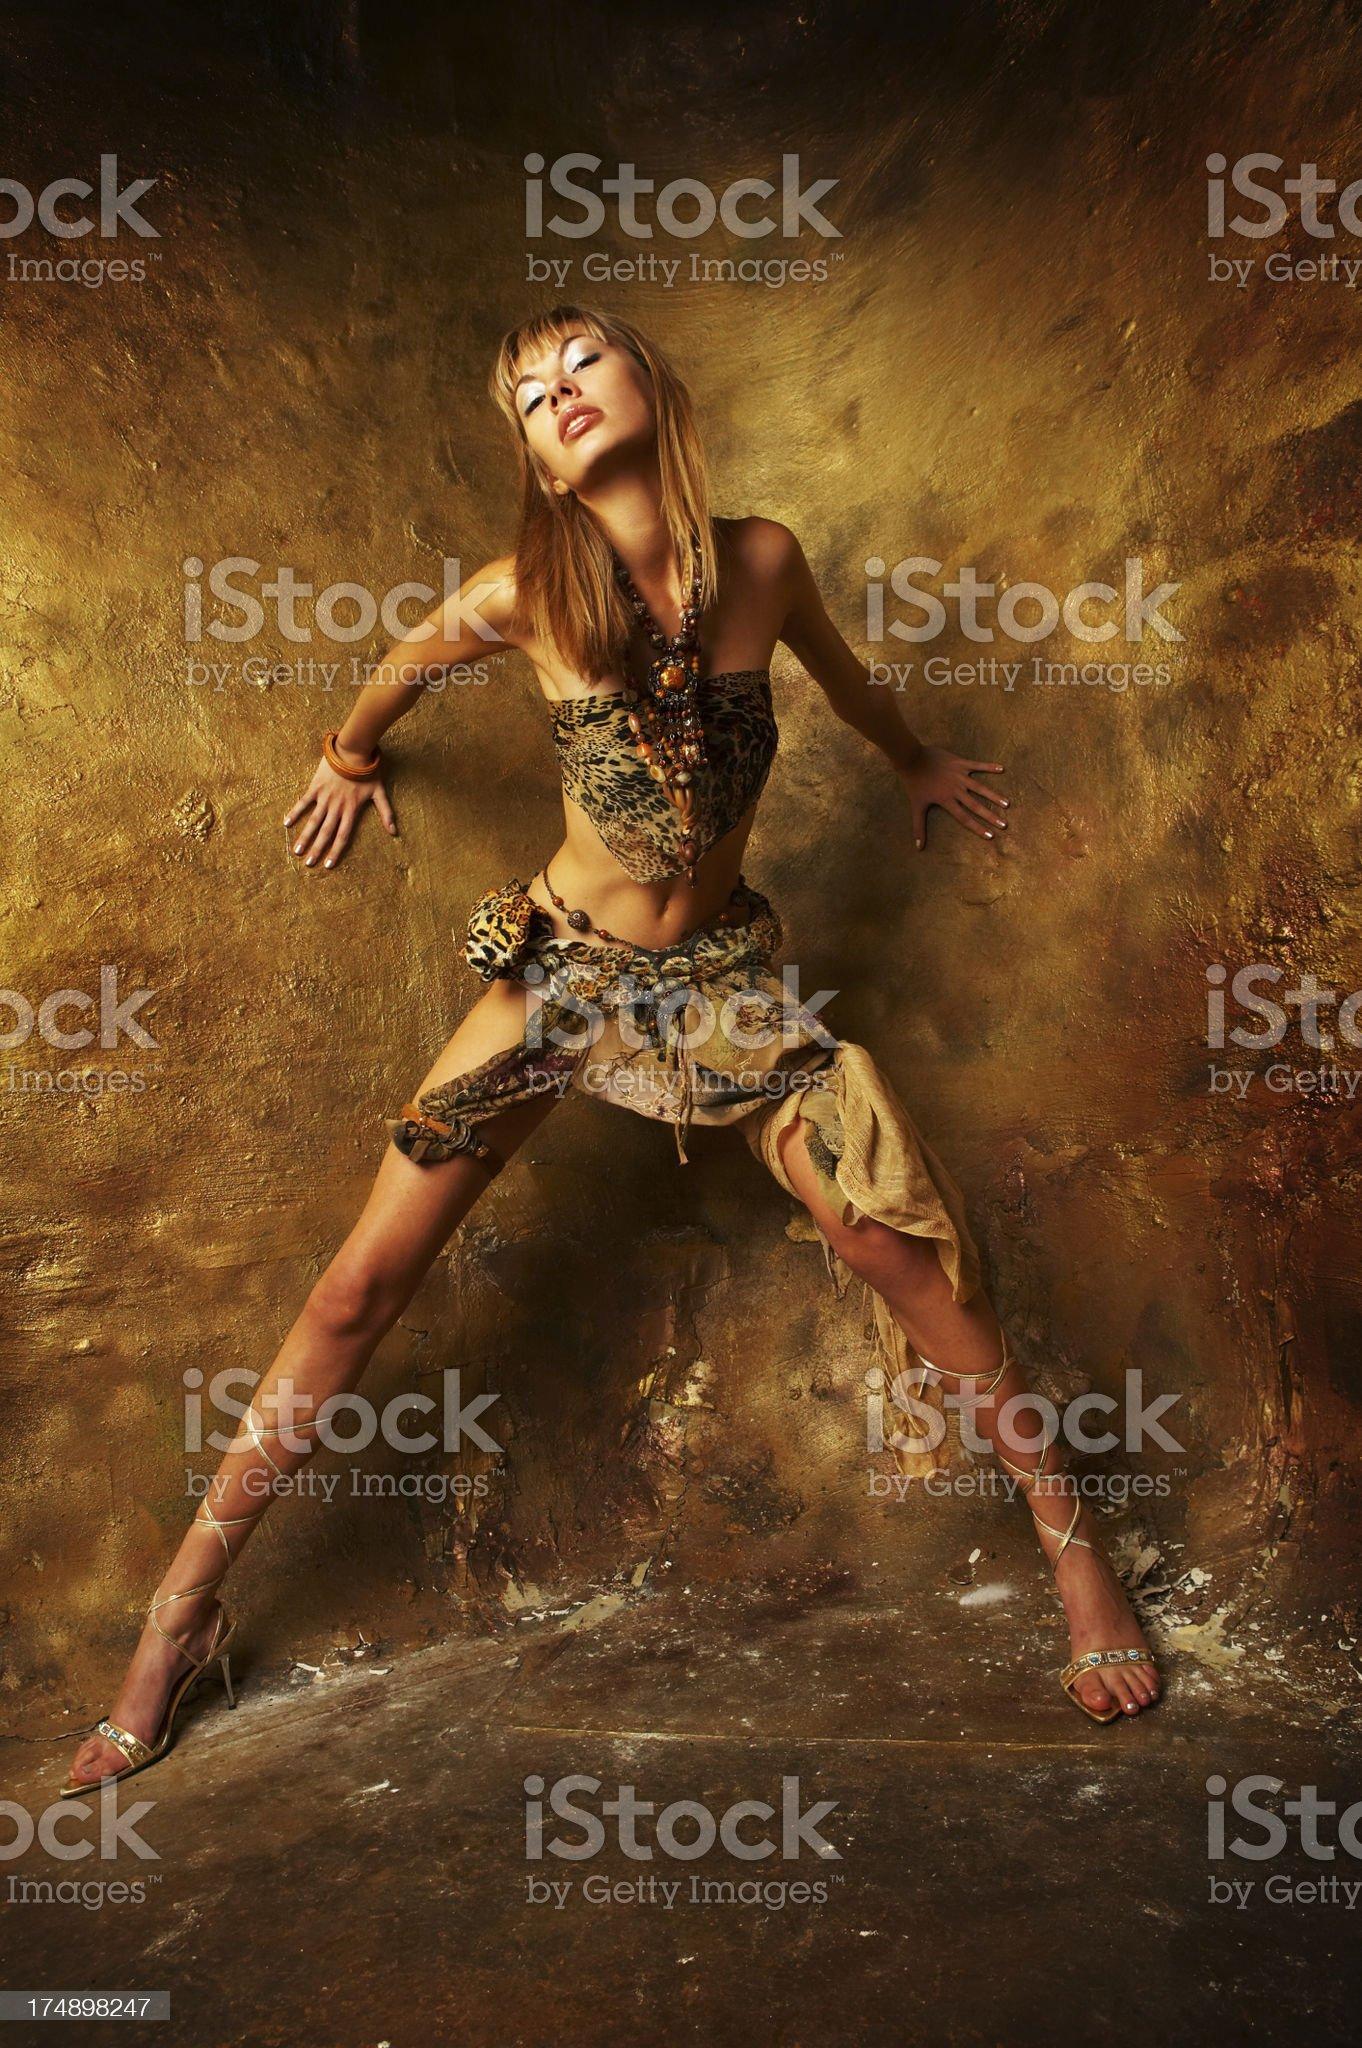 Low key girl royalty-free stock photo